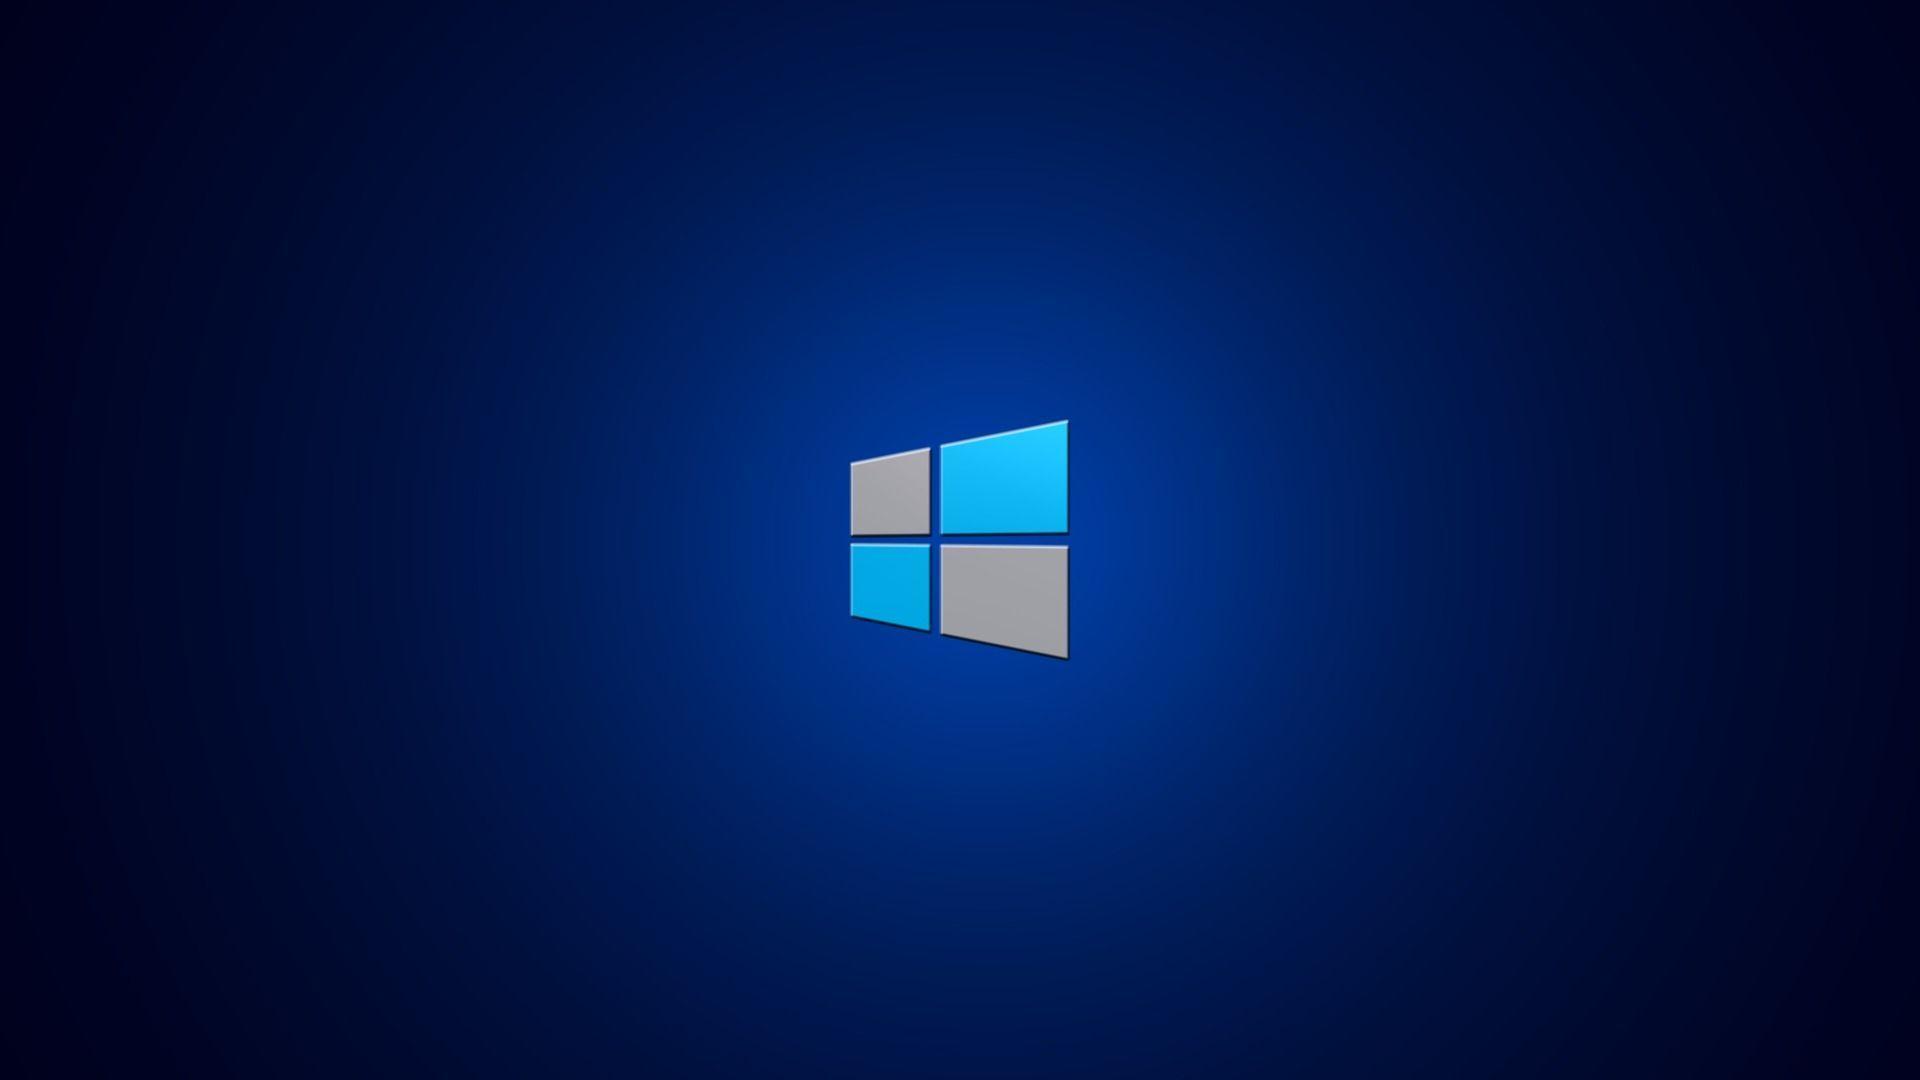 Windows 8 Wallpapers 1080p - Wallpaper Cave